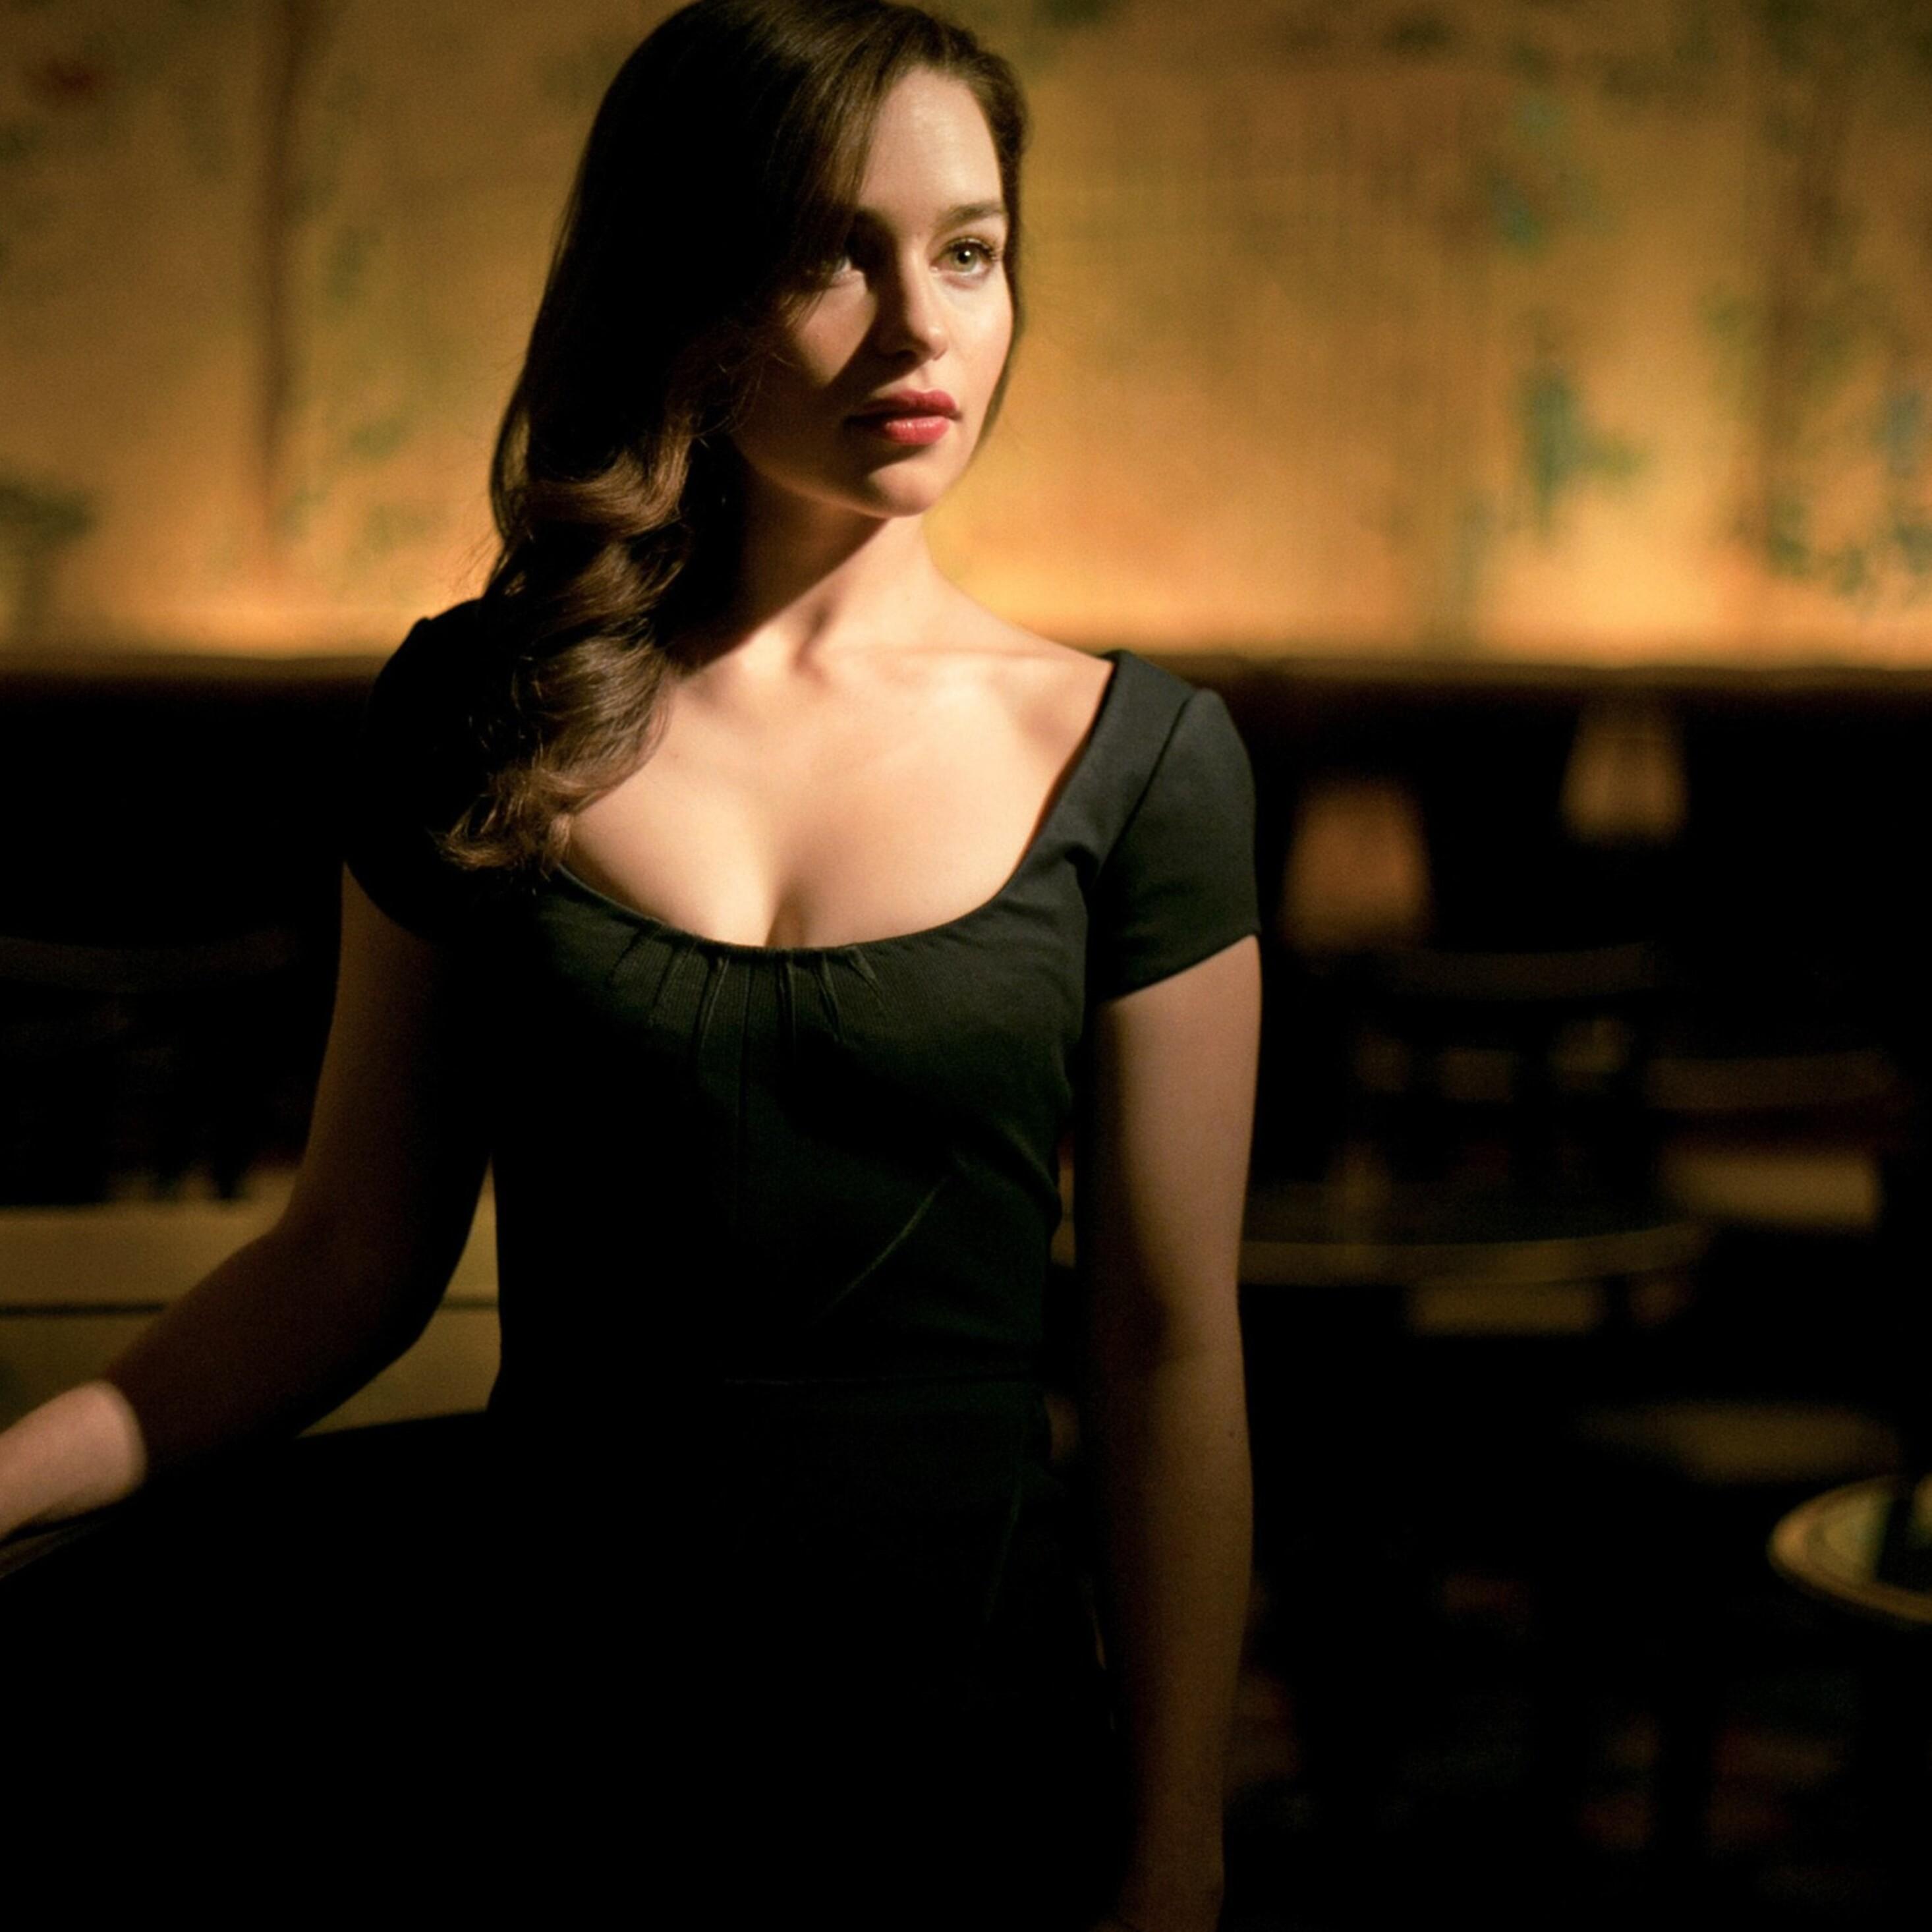 Cleavage Emilia Clarke nude photos 2019